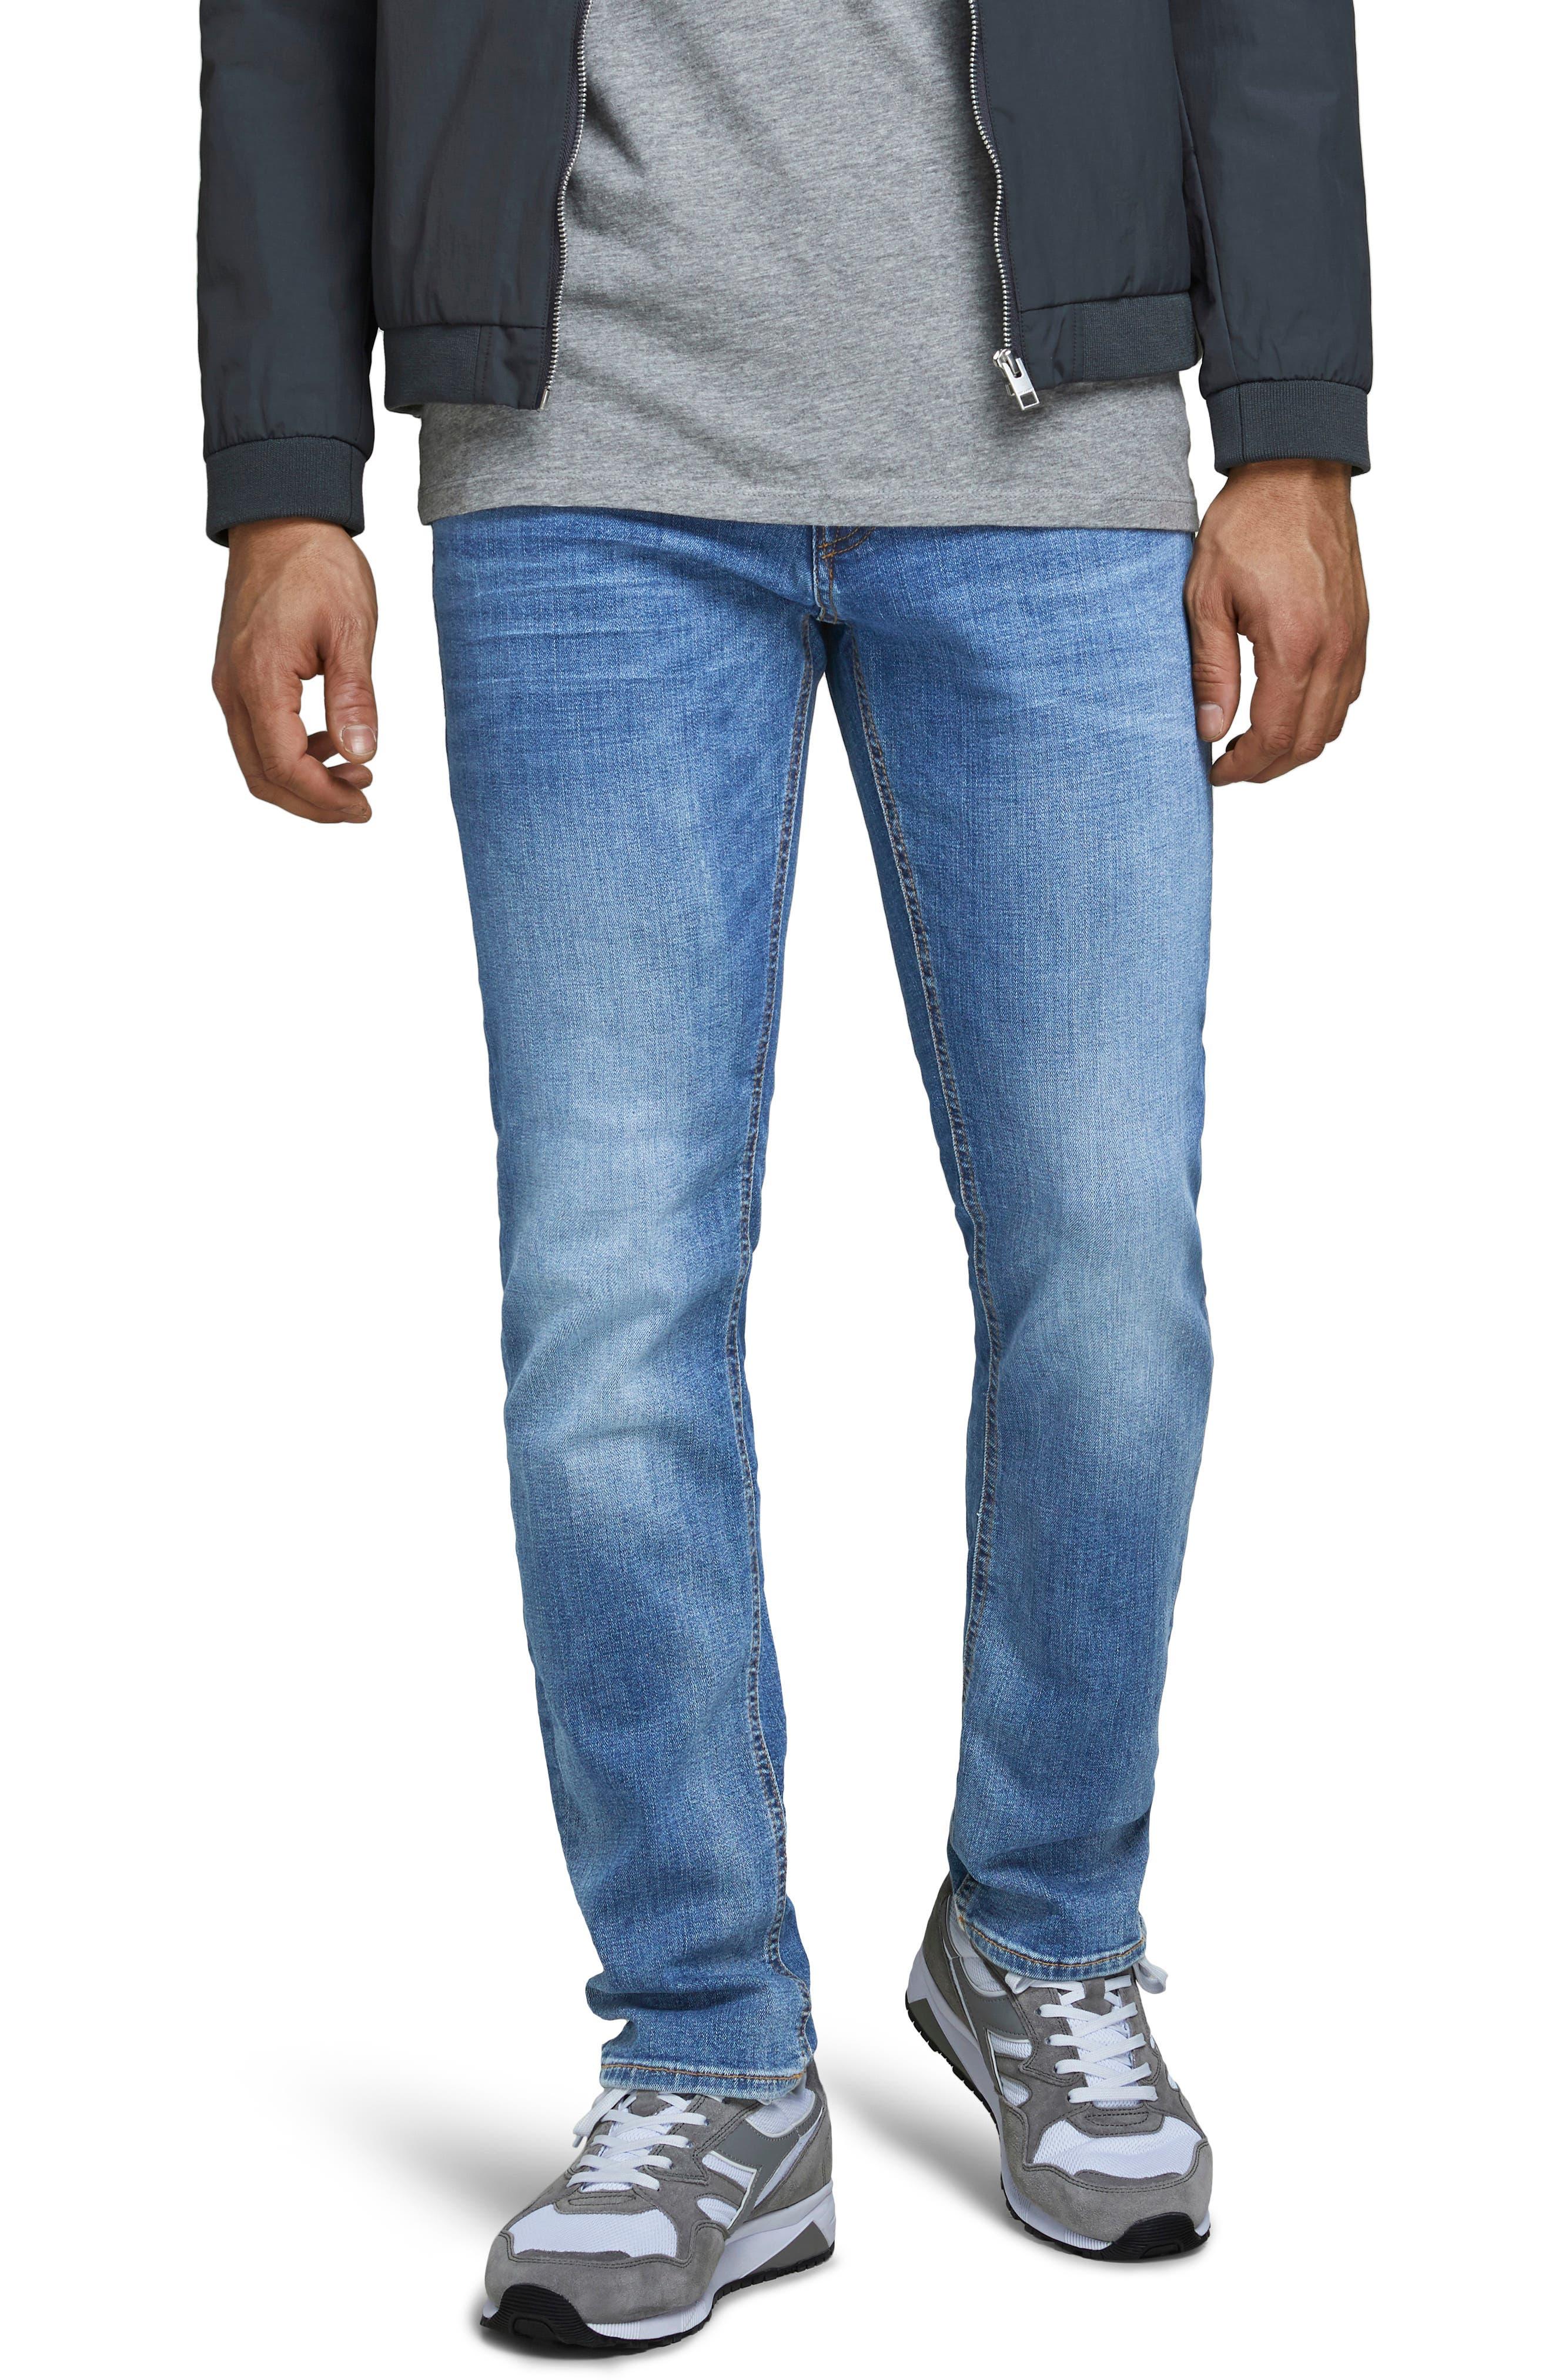 Tim Original Am 781 50Sps Slim Straight Leg Jeans